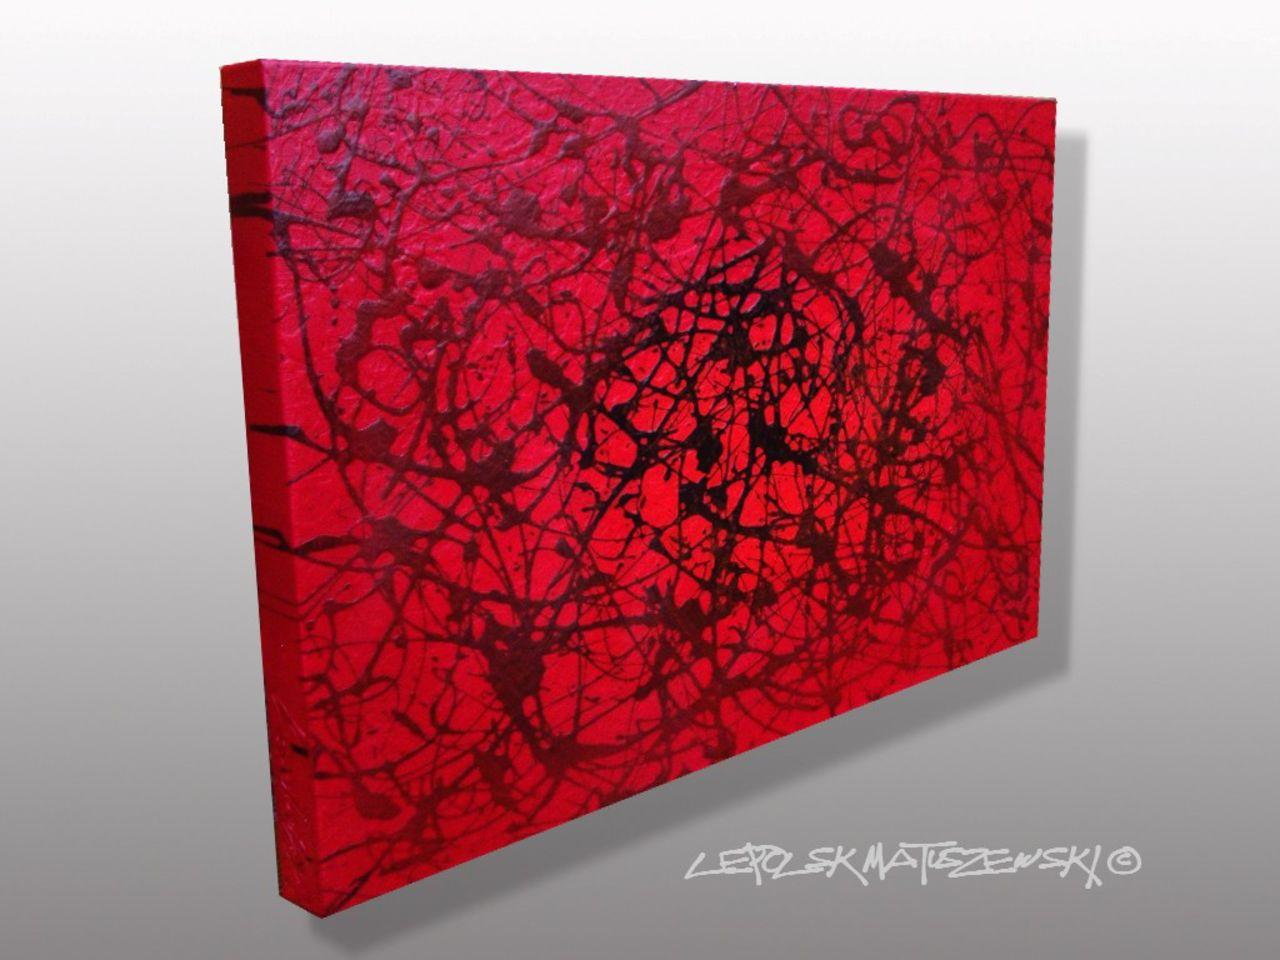 MK  Lepolsk Matuszewski FLOW  Expressionnisme abstrait contemporain